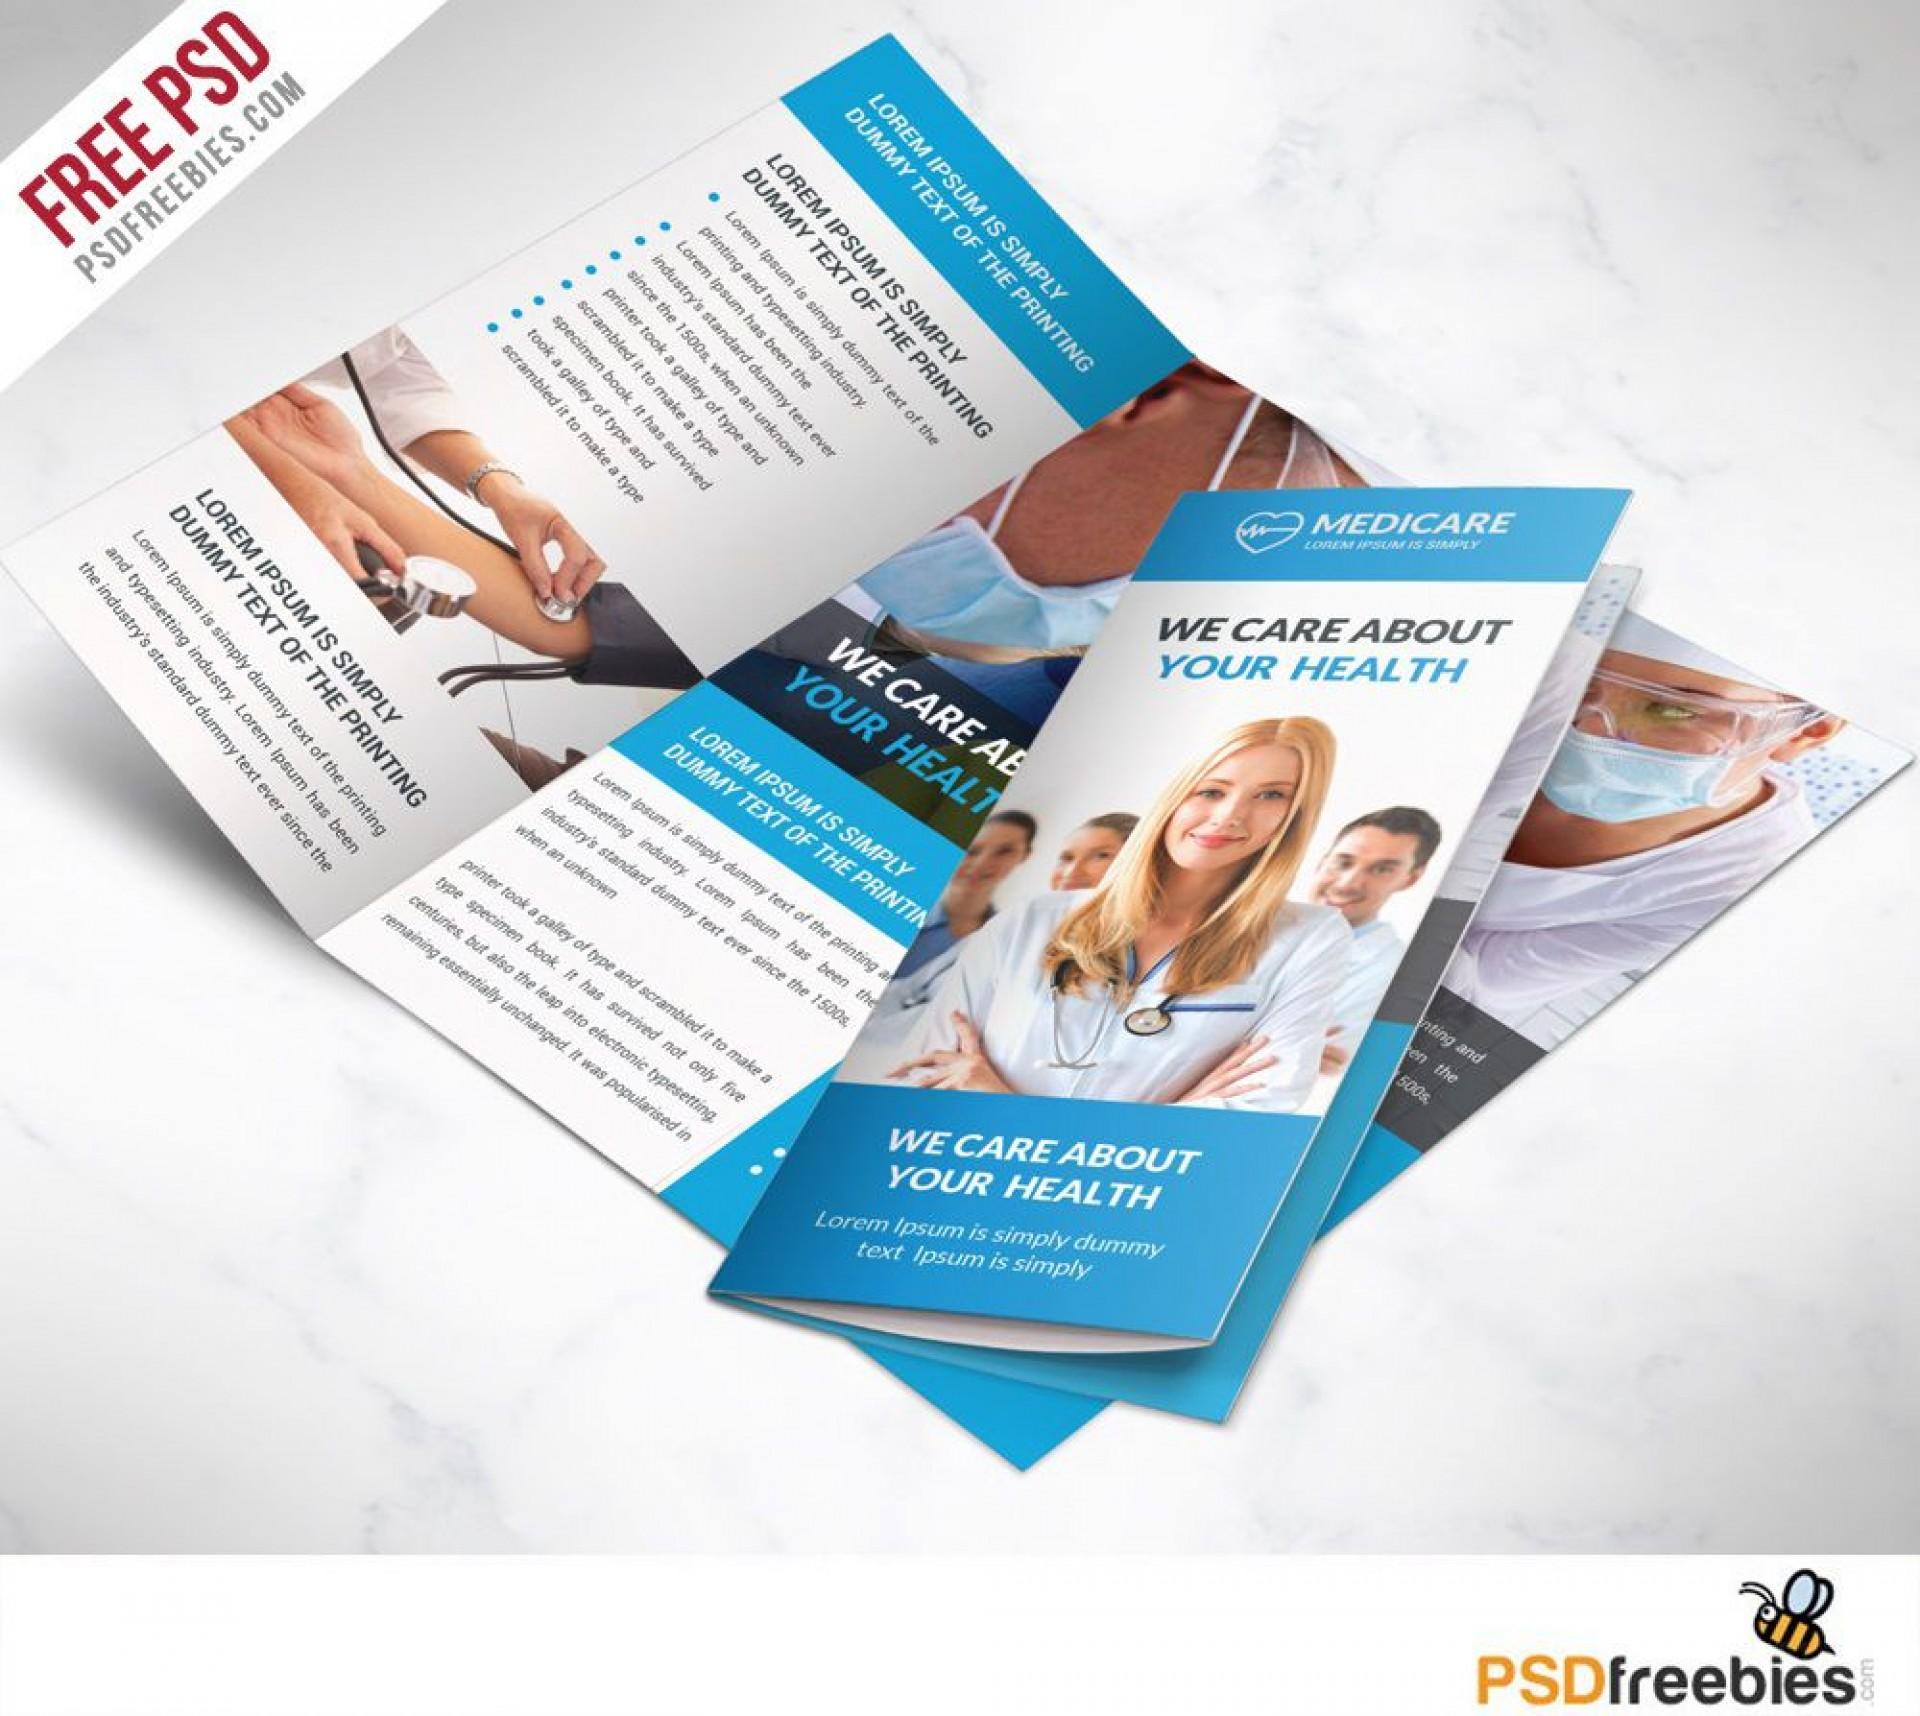 006 Stunning Free Tri Fold Brochure Template High Resolution  Photoshop Illustrator Microsoft Word 20101920